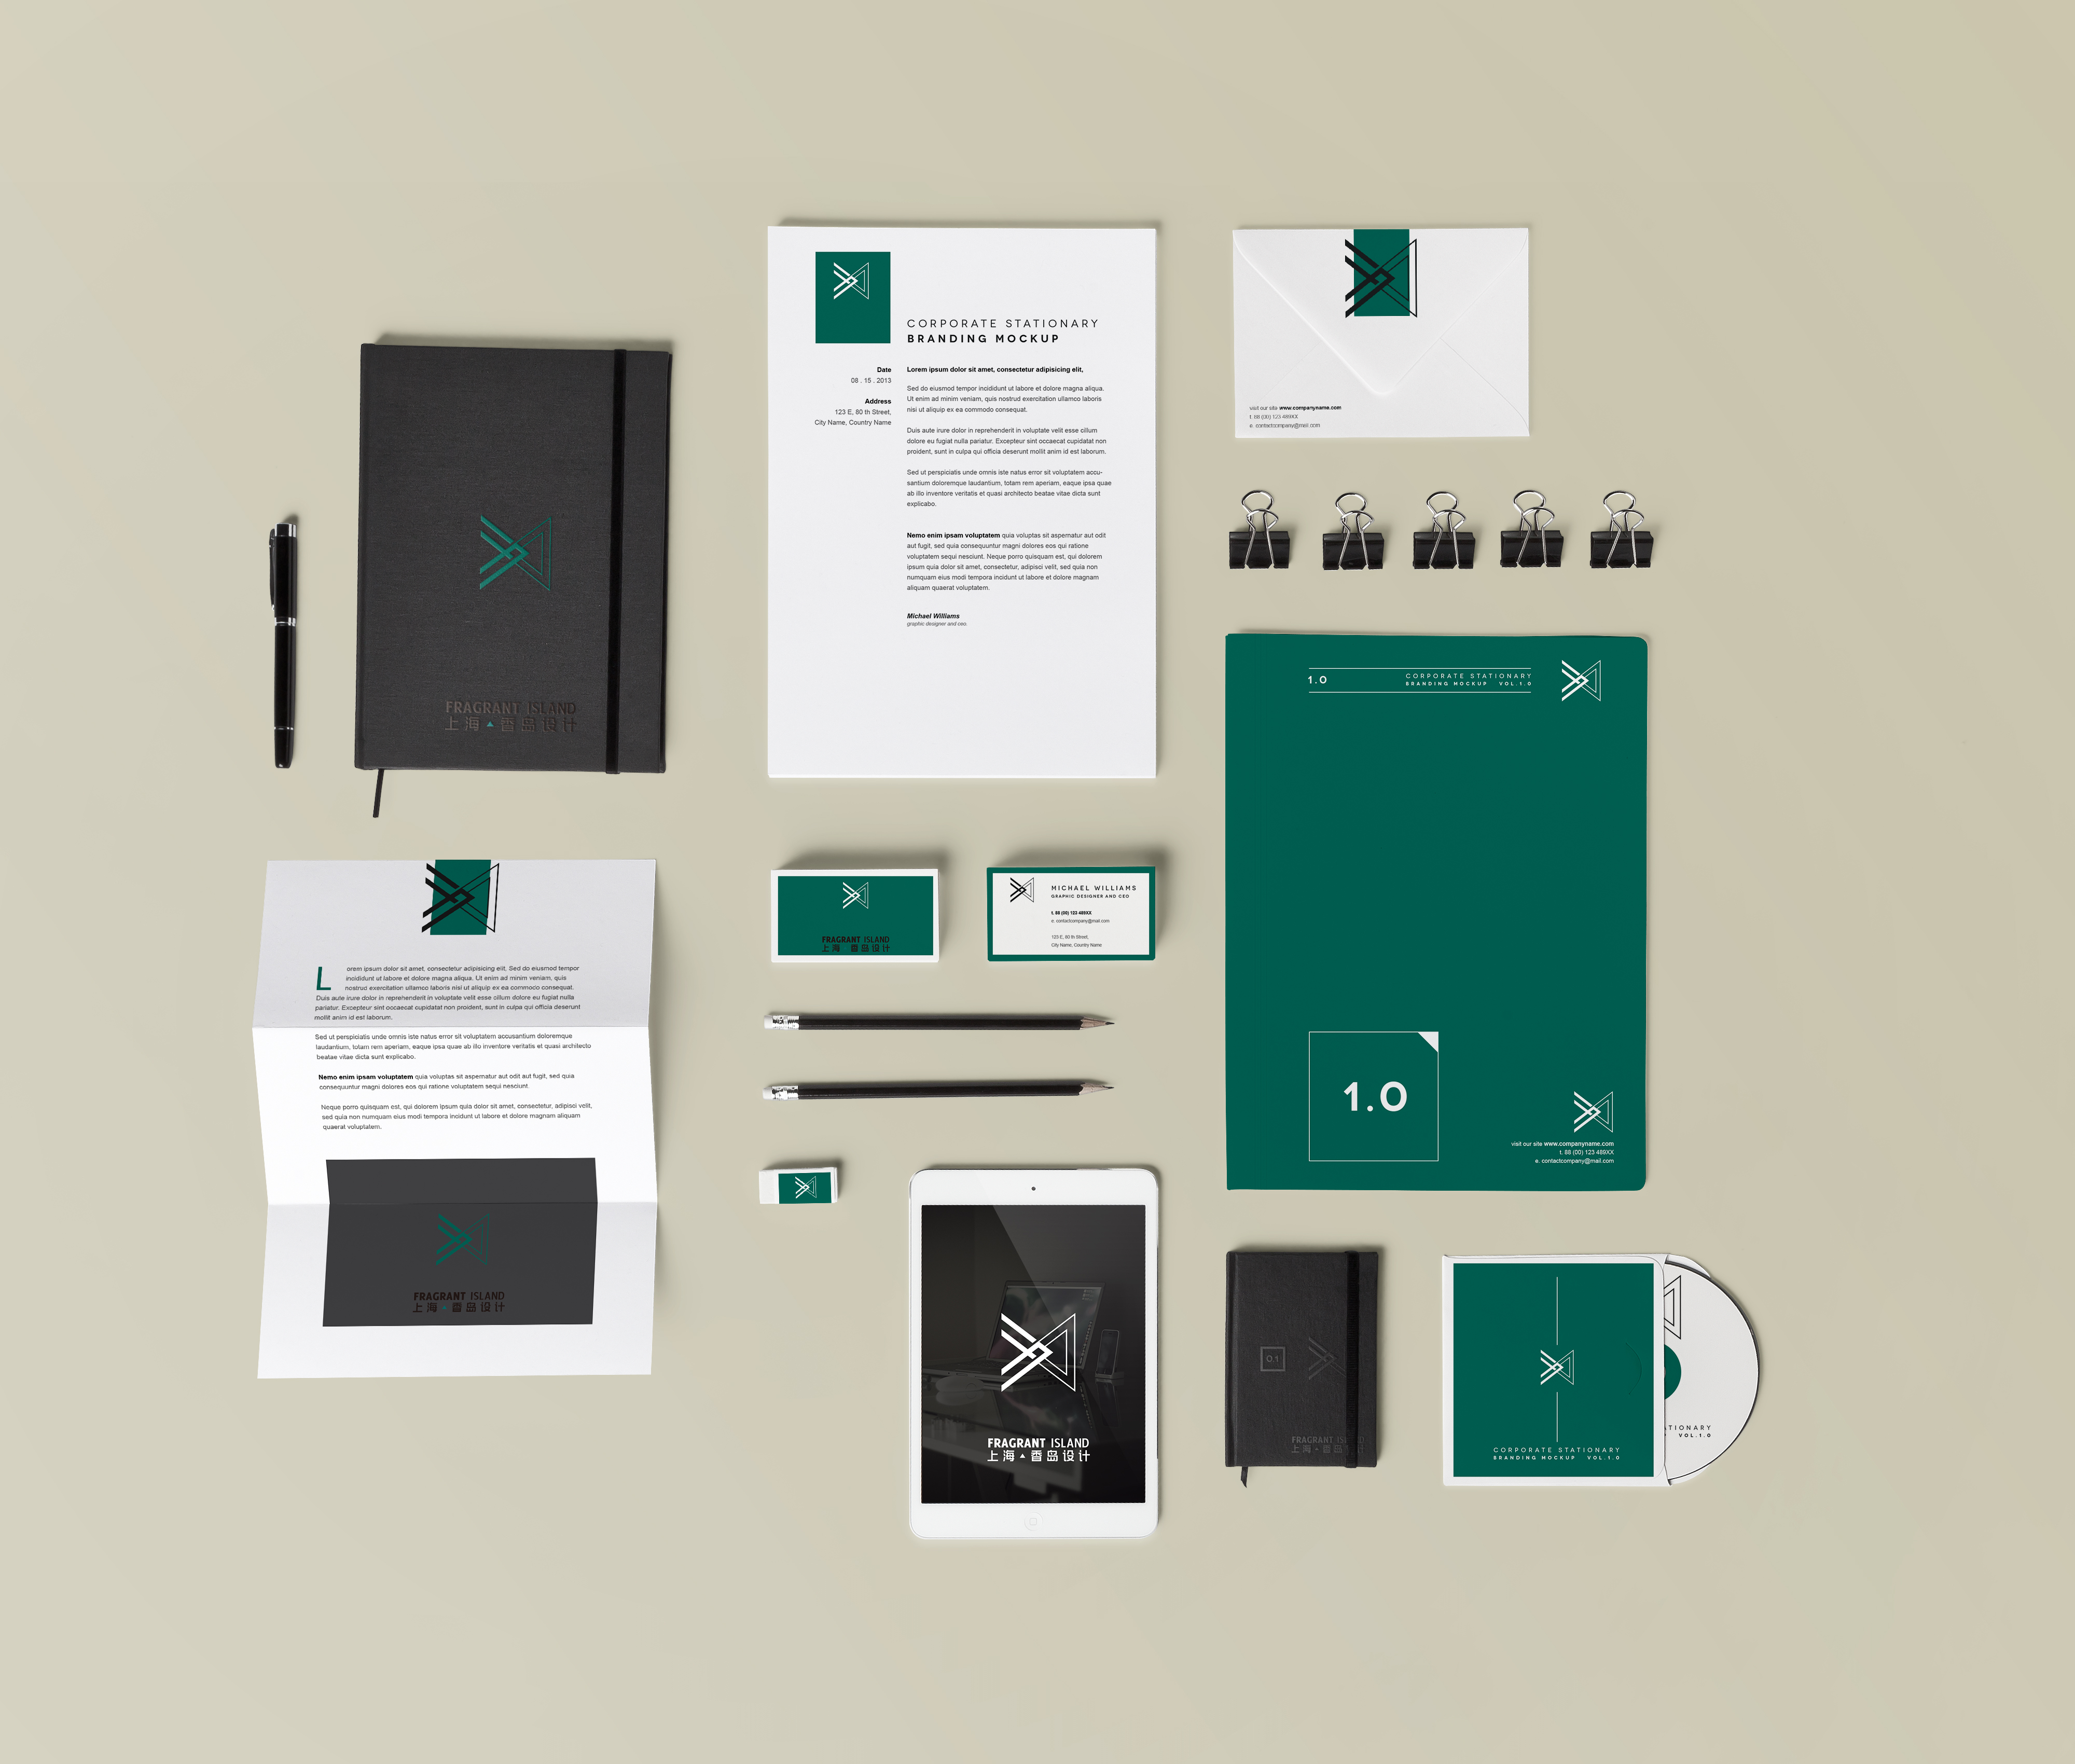 【VI设计】VI导视设计/商业环境形象/VI基础/广告标示